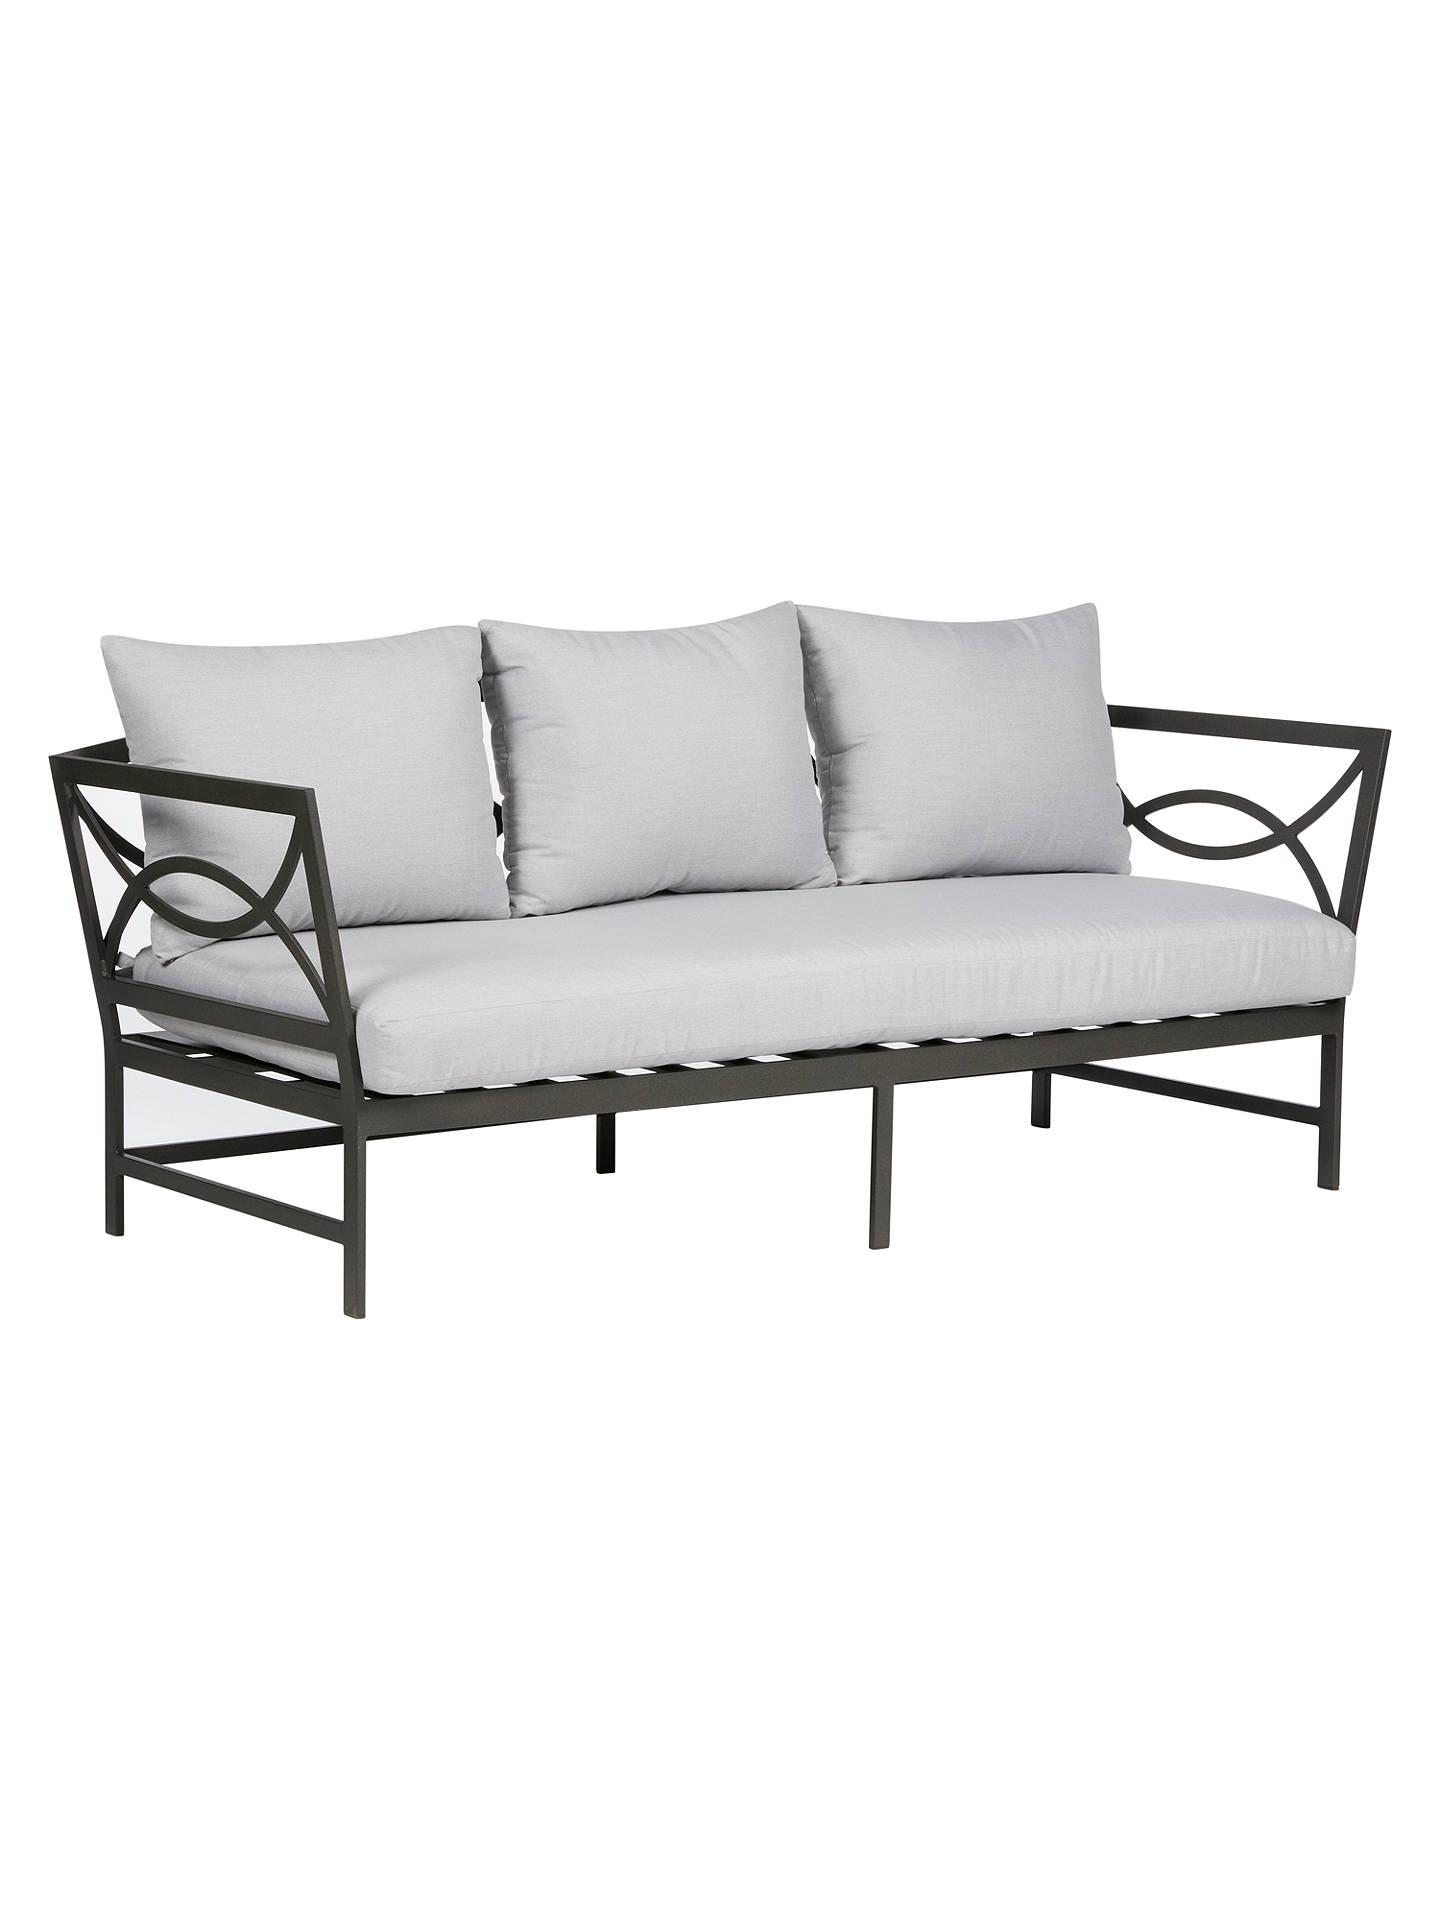 Buyjohn lewis partners marlow aluminium 3 seater sofa black grey online at johnlewis